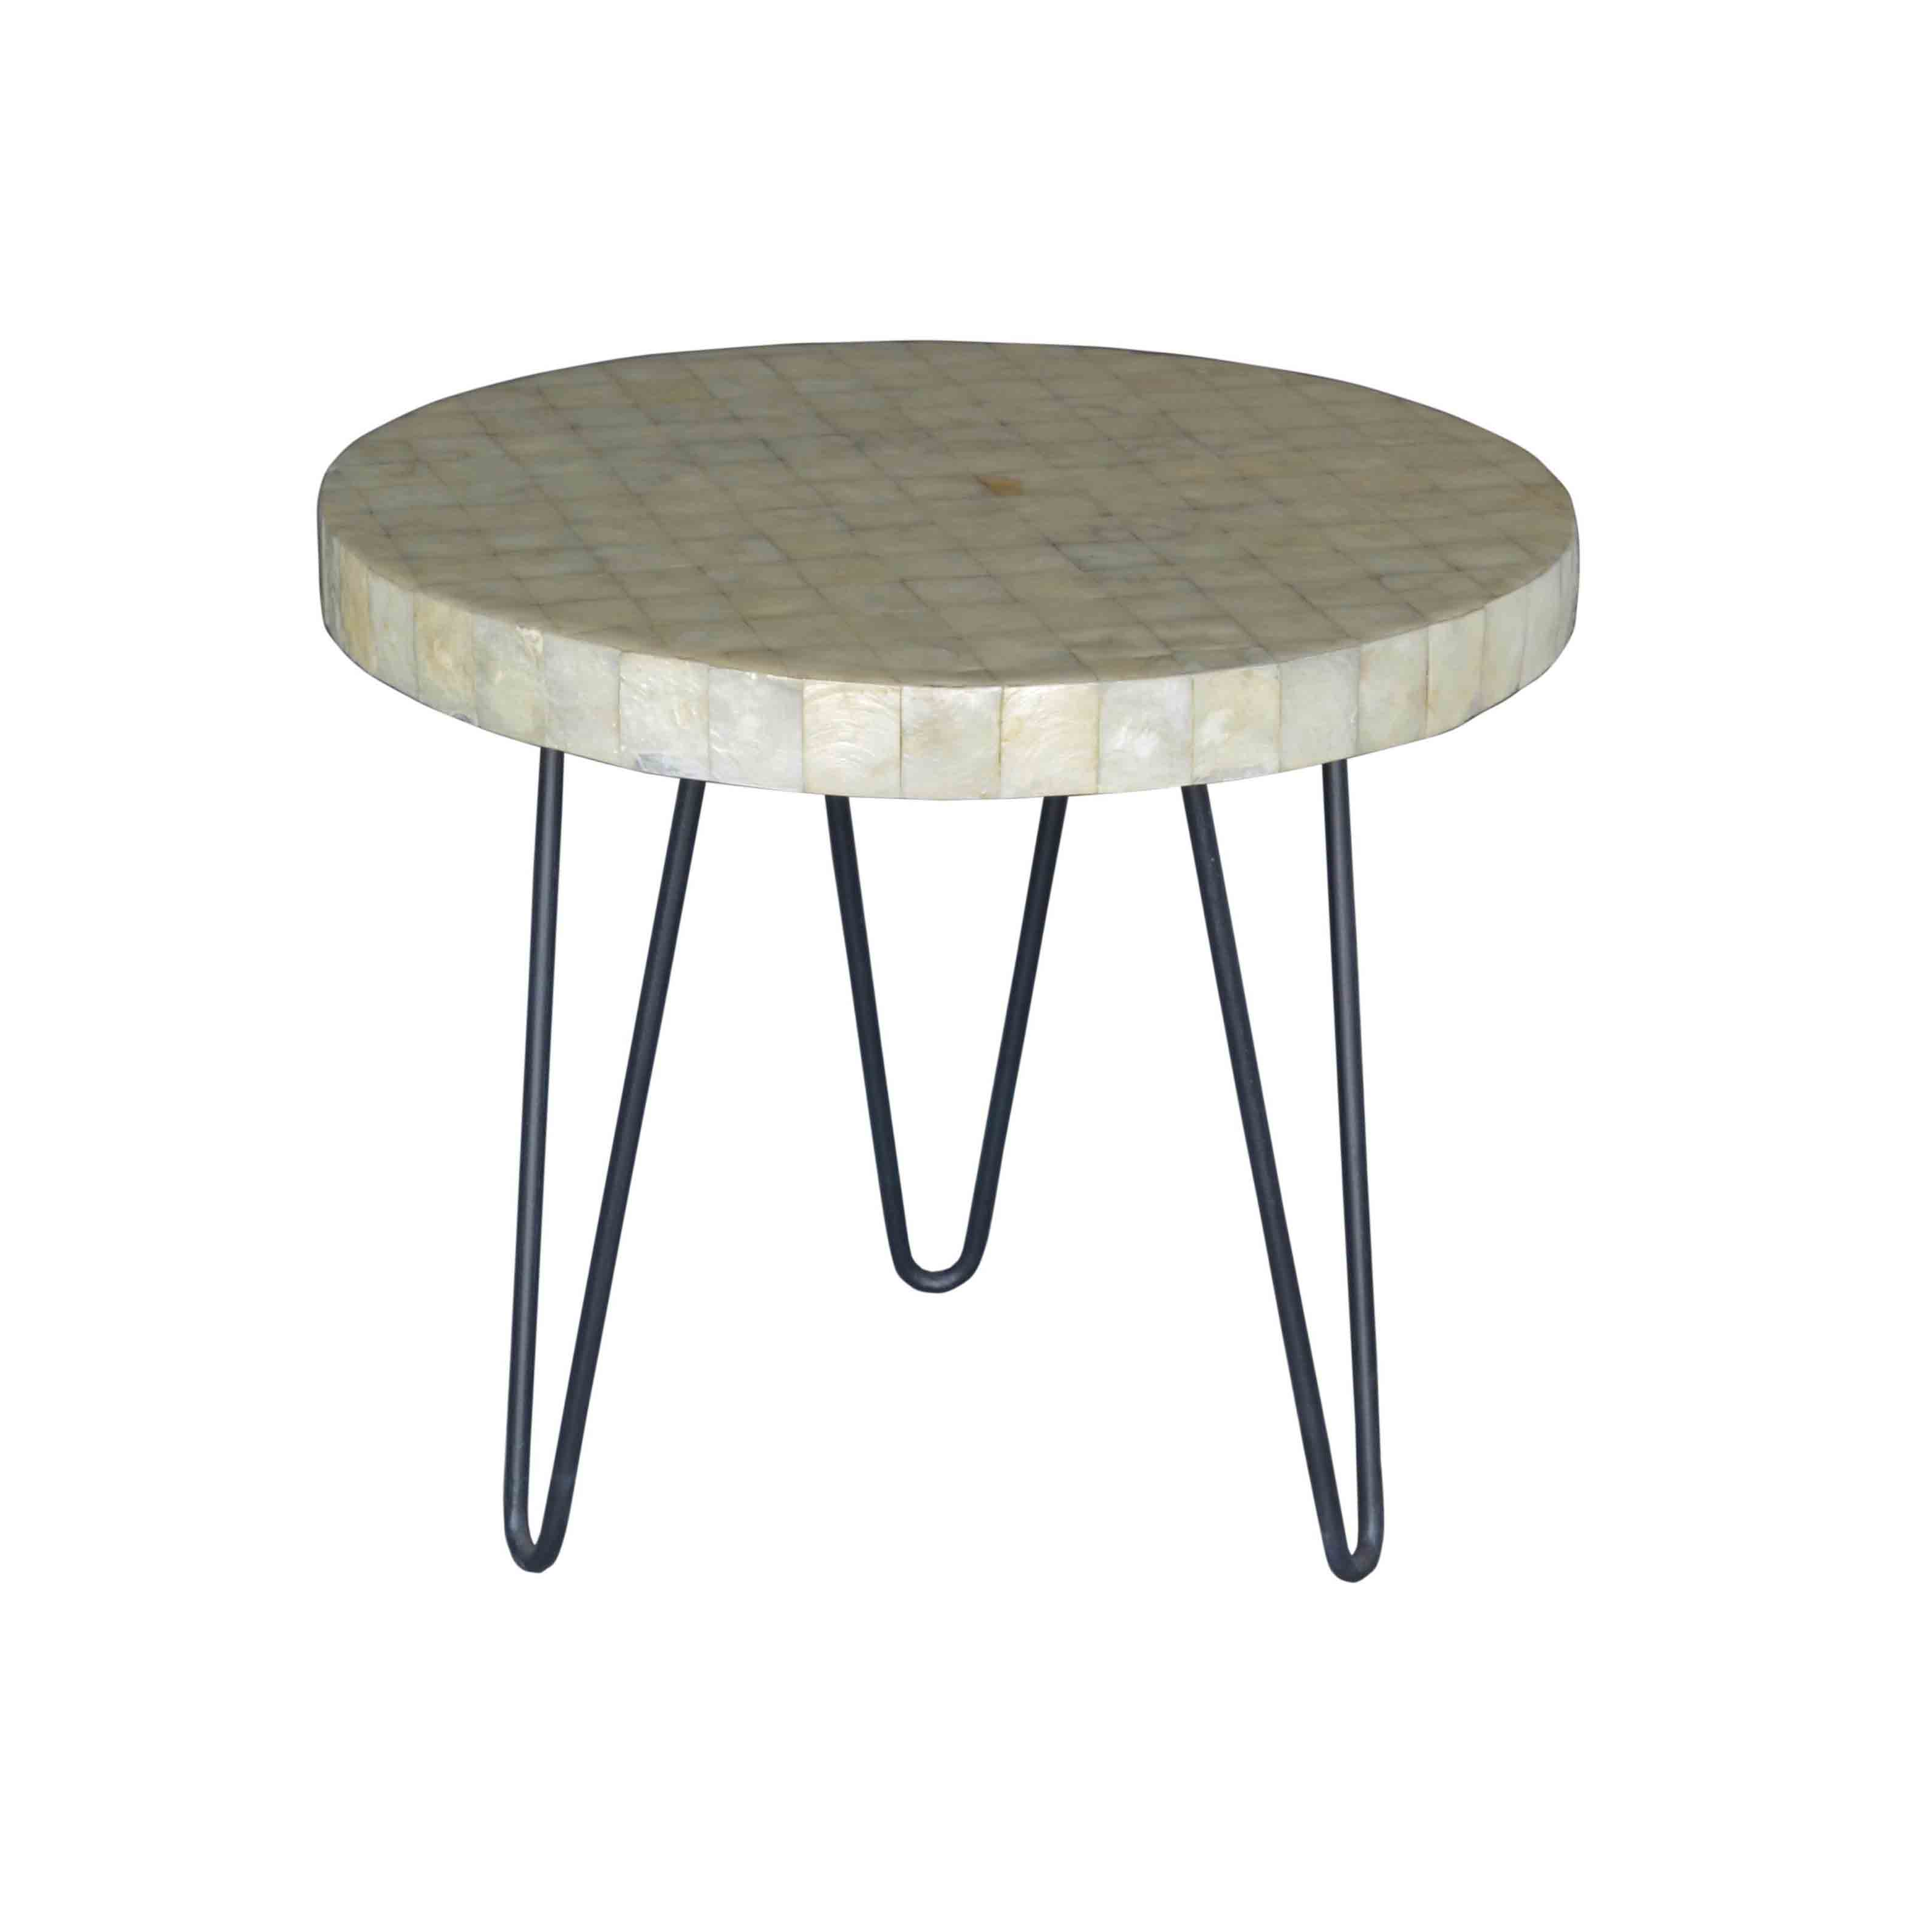 Round White Capiz Coffee Table: Buchan Round Side Table